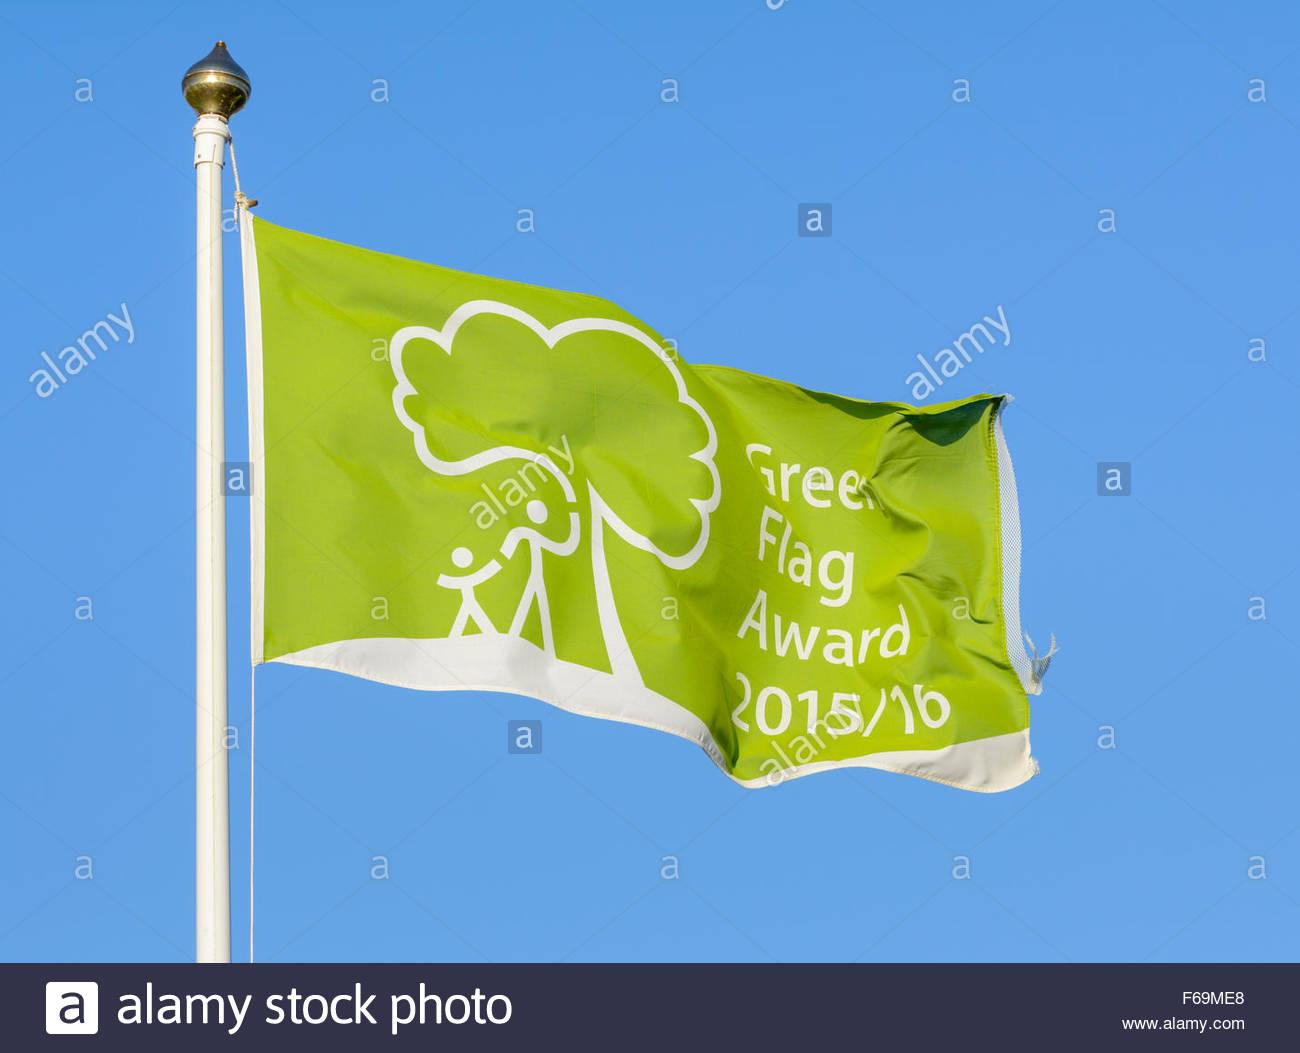 Green Flag Award 2015/16 flag at Mewsbrook Park in Littlehampton, West Sussex, England, UK. - Stock Image